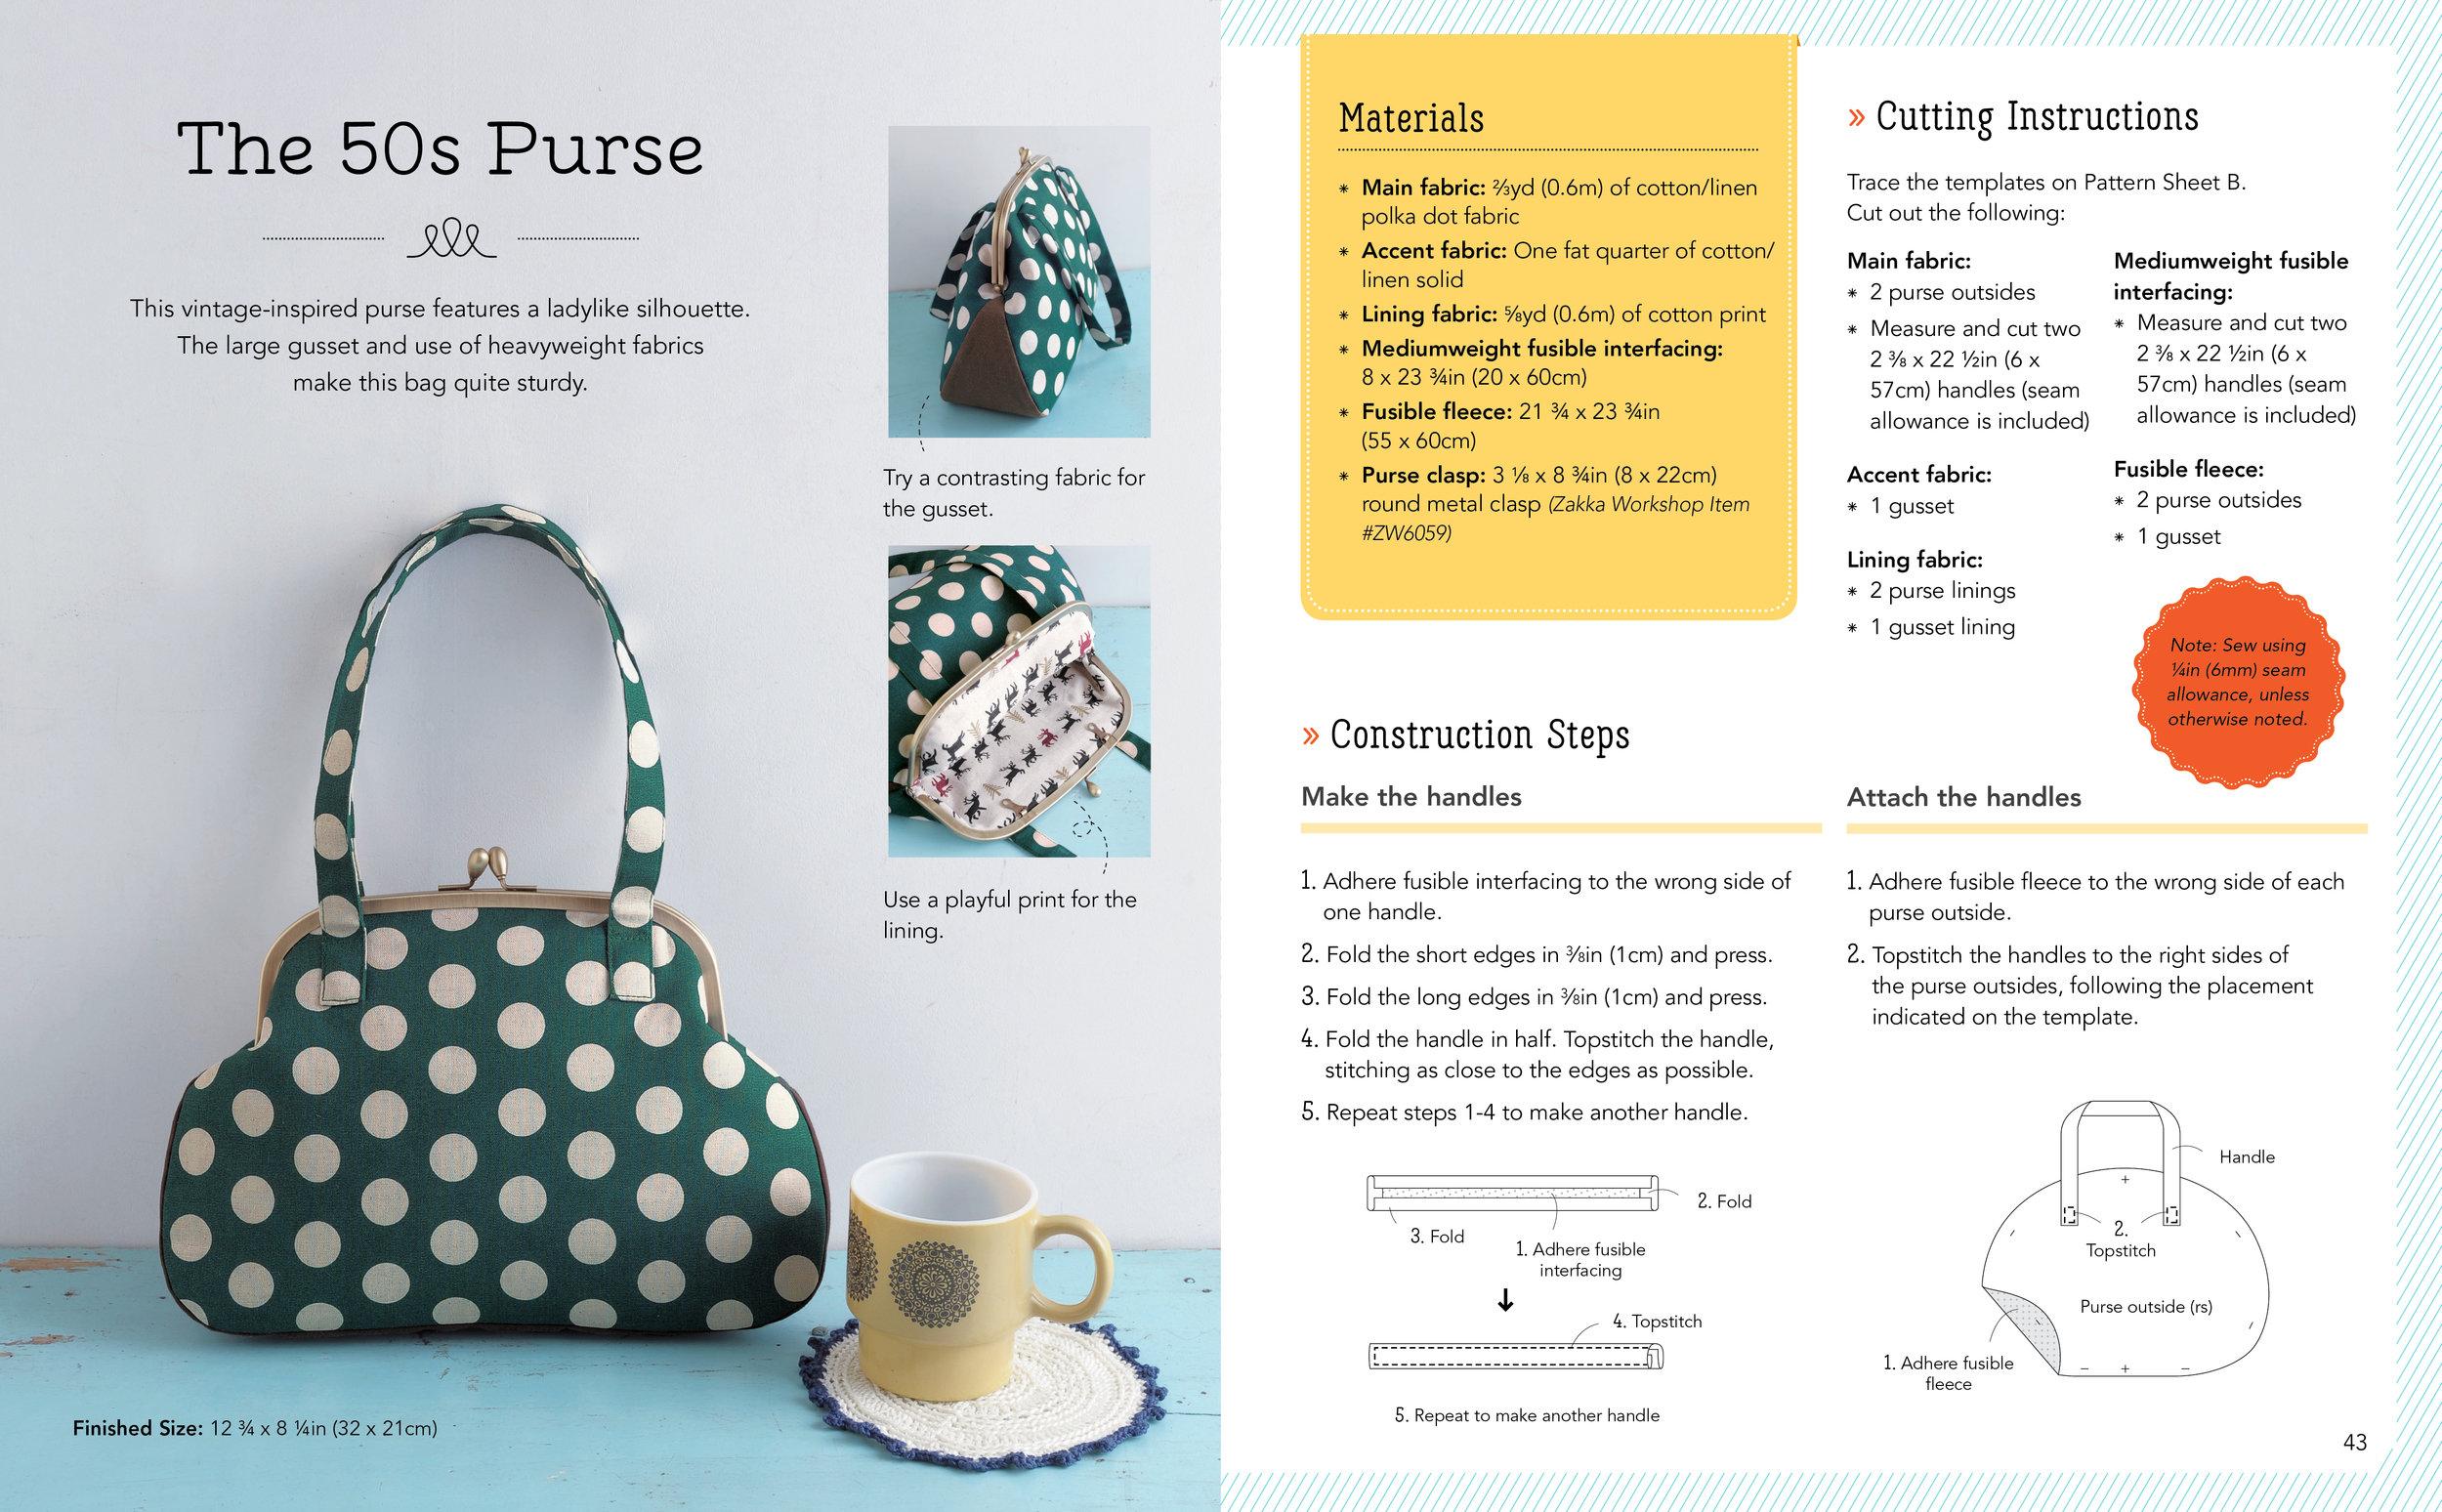 The Purse Clasp Book 42.43.jpg